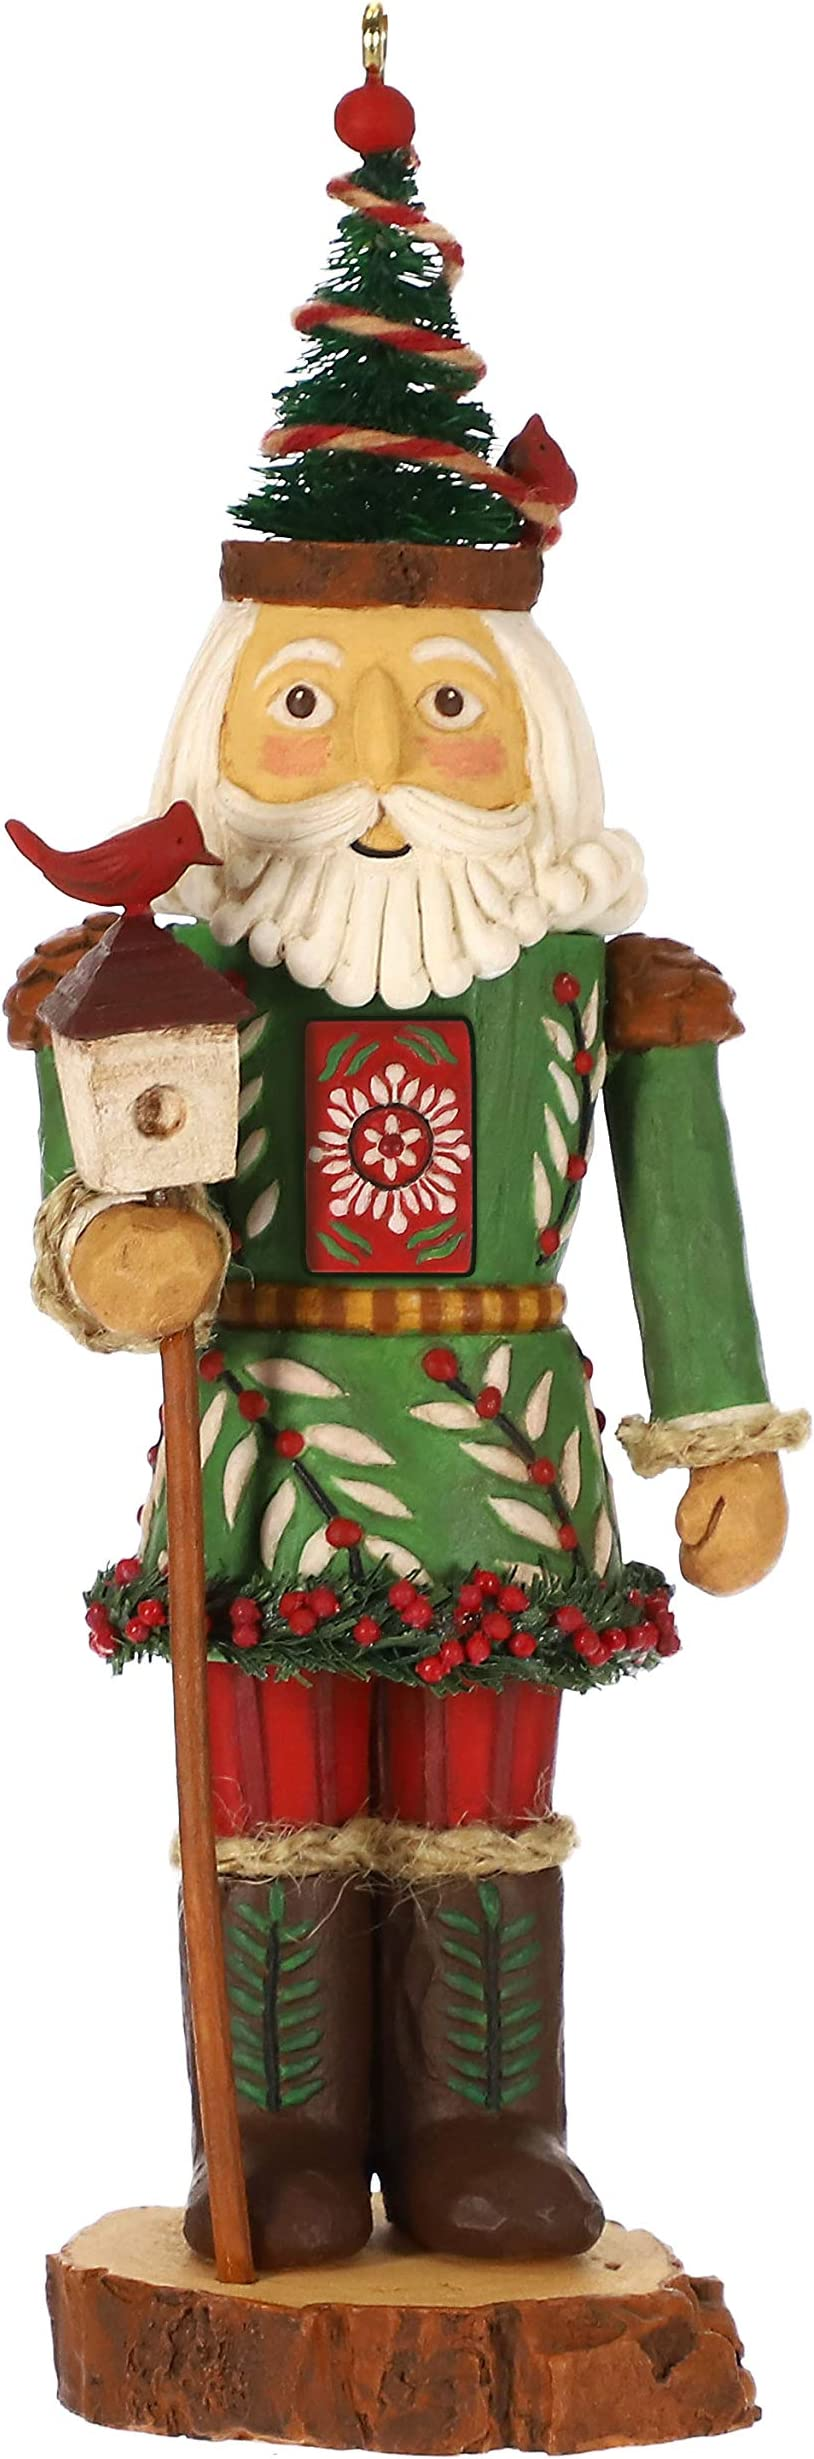 Keepsake Nutcracker Ornament PERSONALIZED NUTCRACKER Ornament